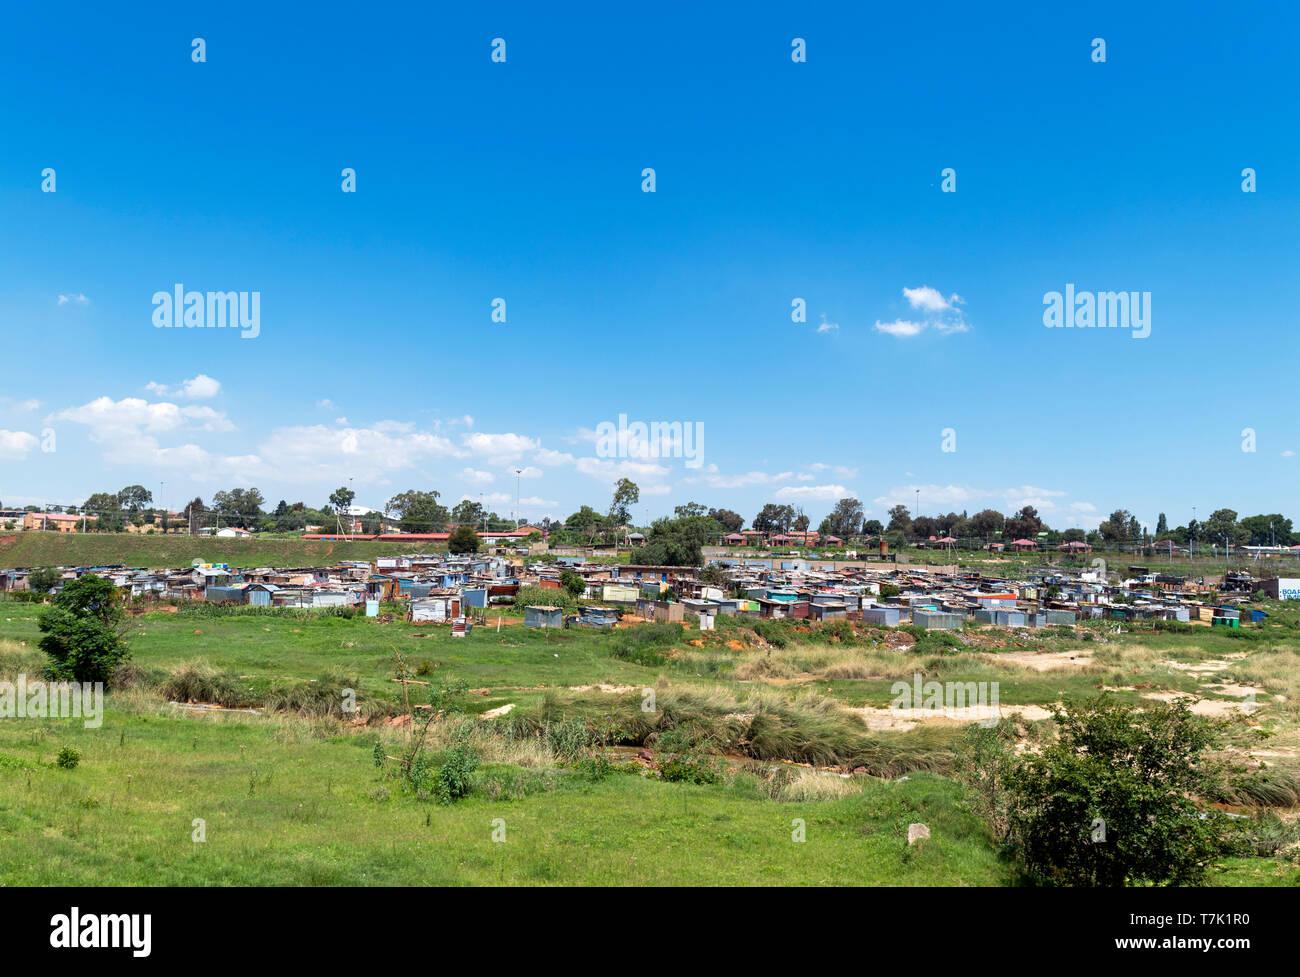 Slum dwellings in Orlando West, Soweto, Johannesburg, South Africa Stock Photo